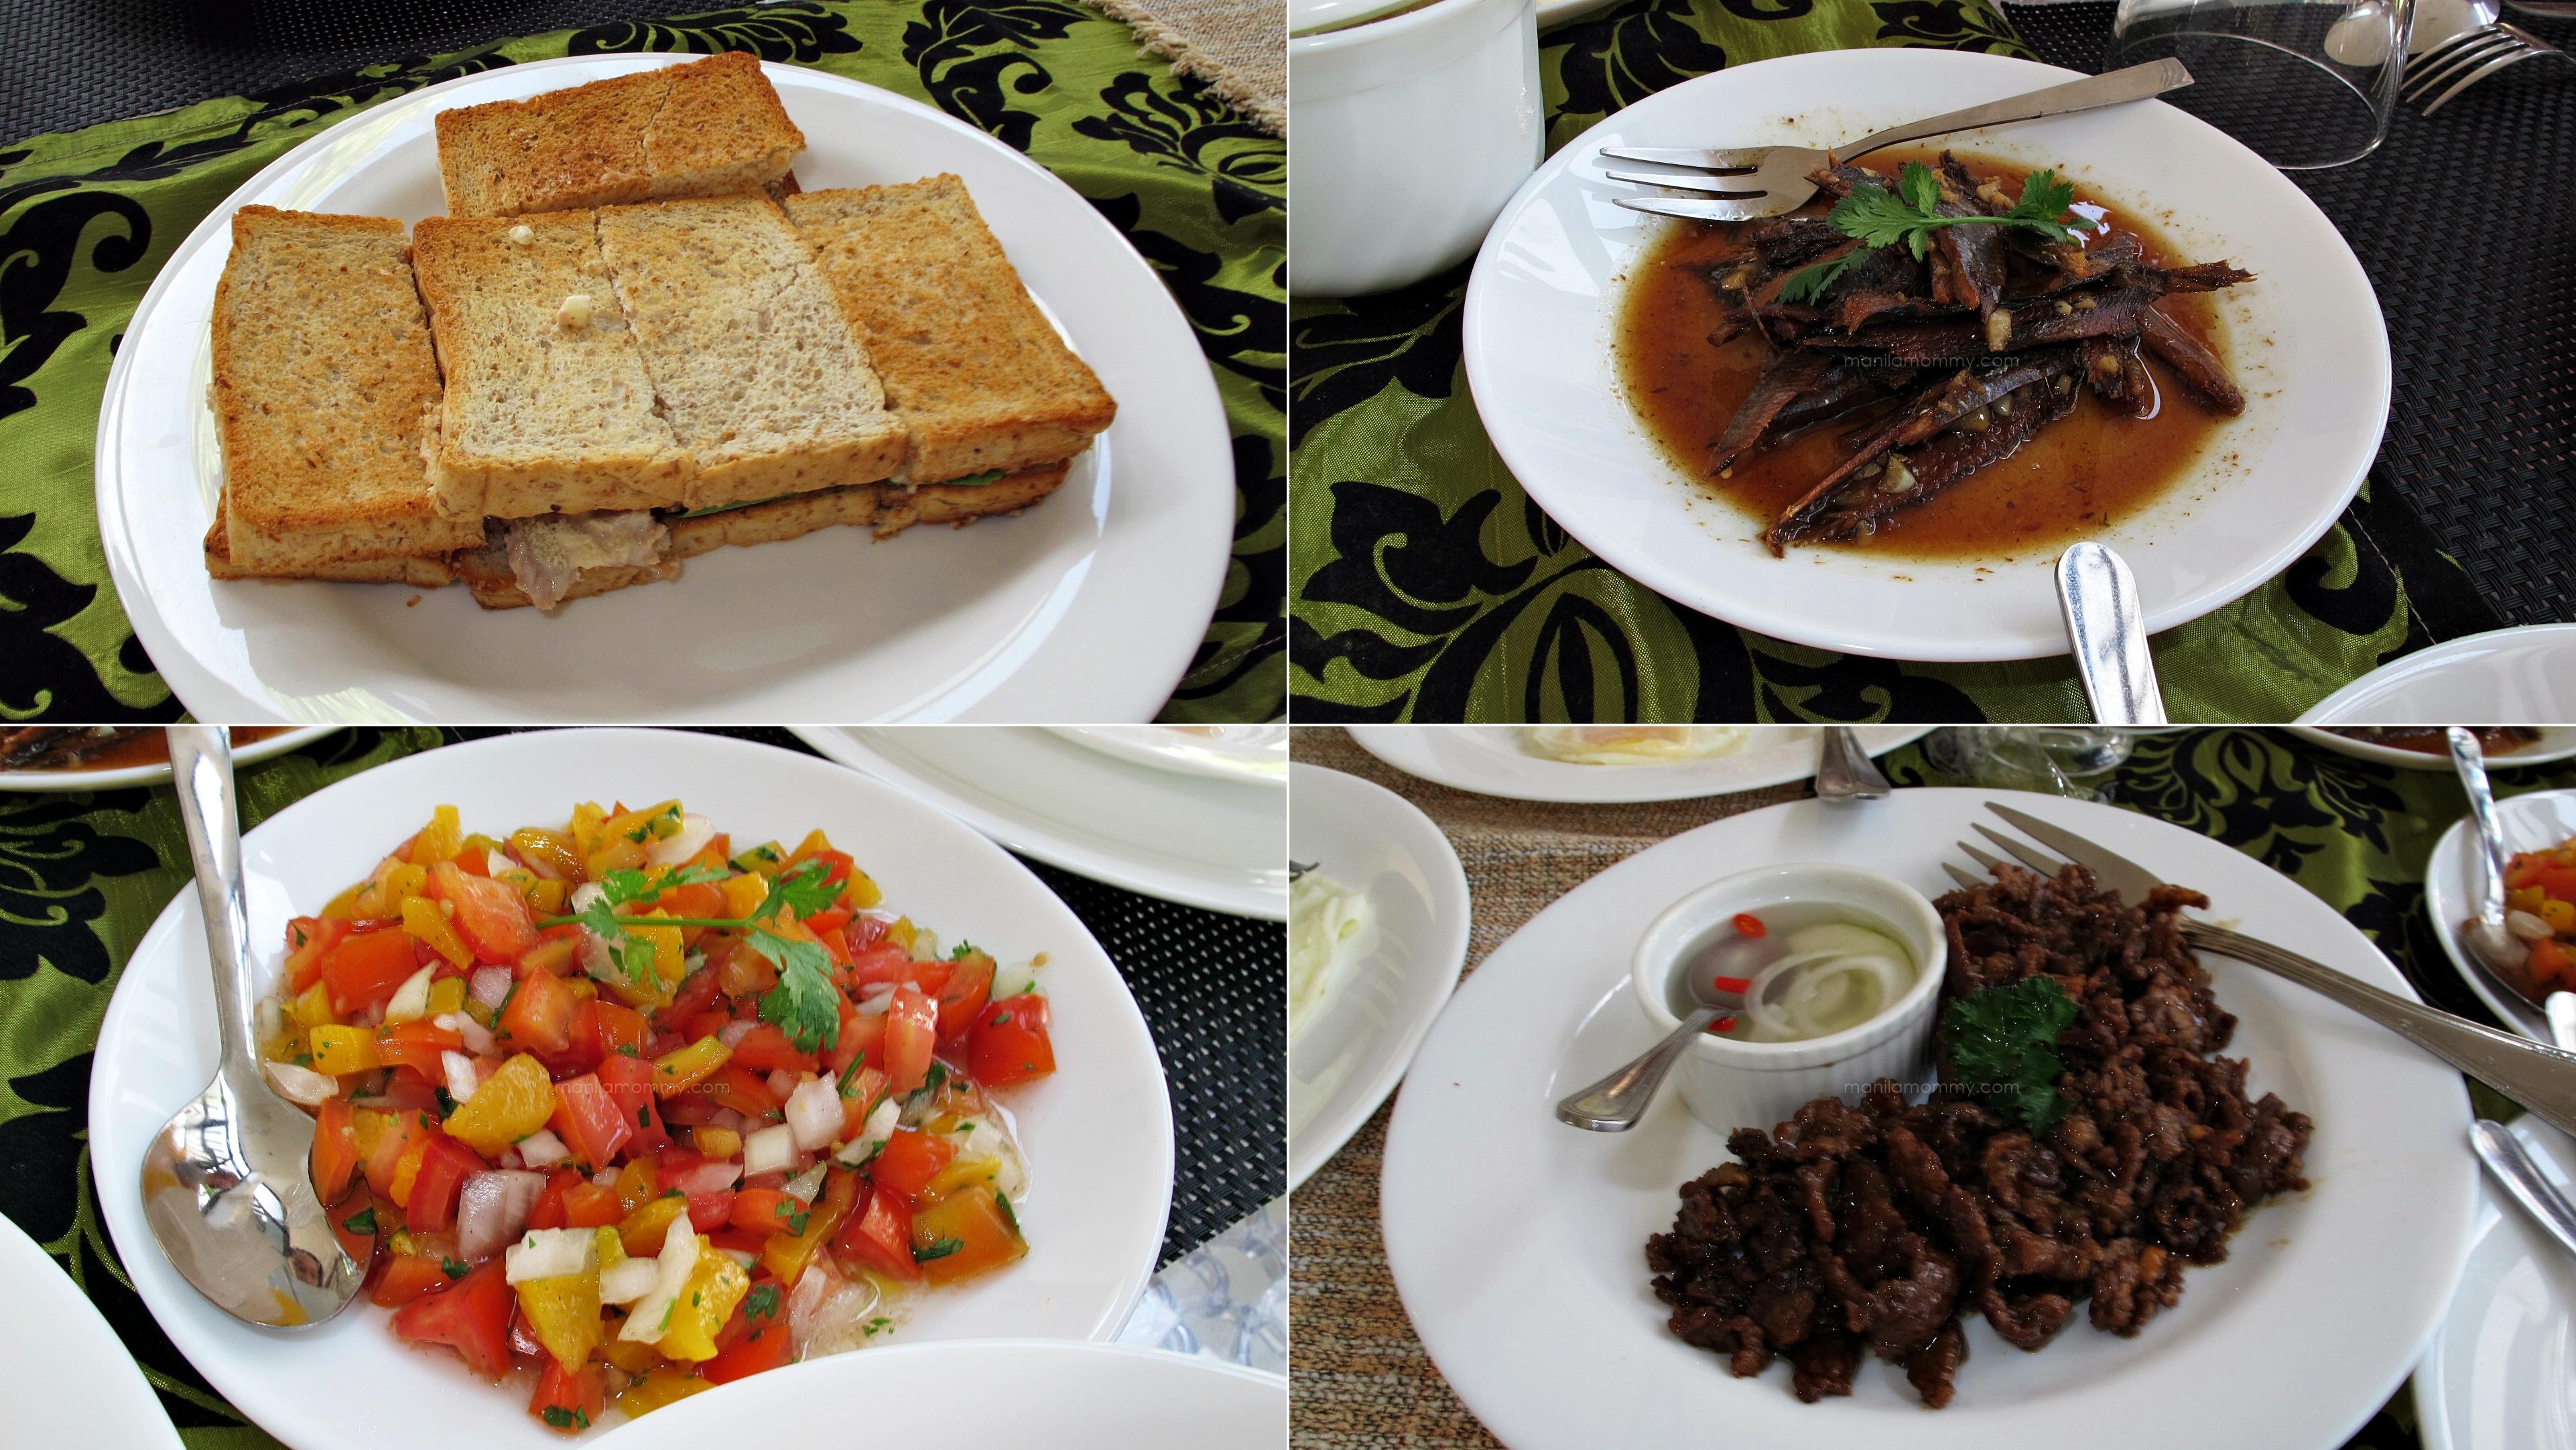 Wilsons Place Tagaytay Breakfast